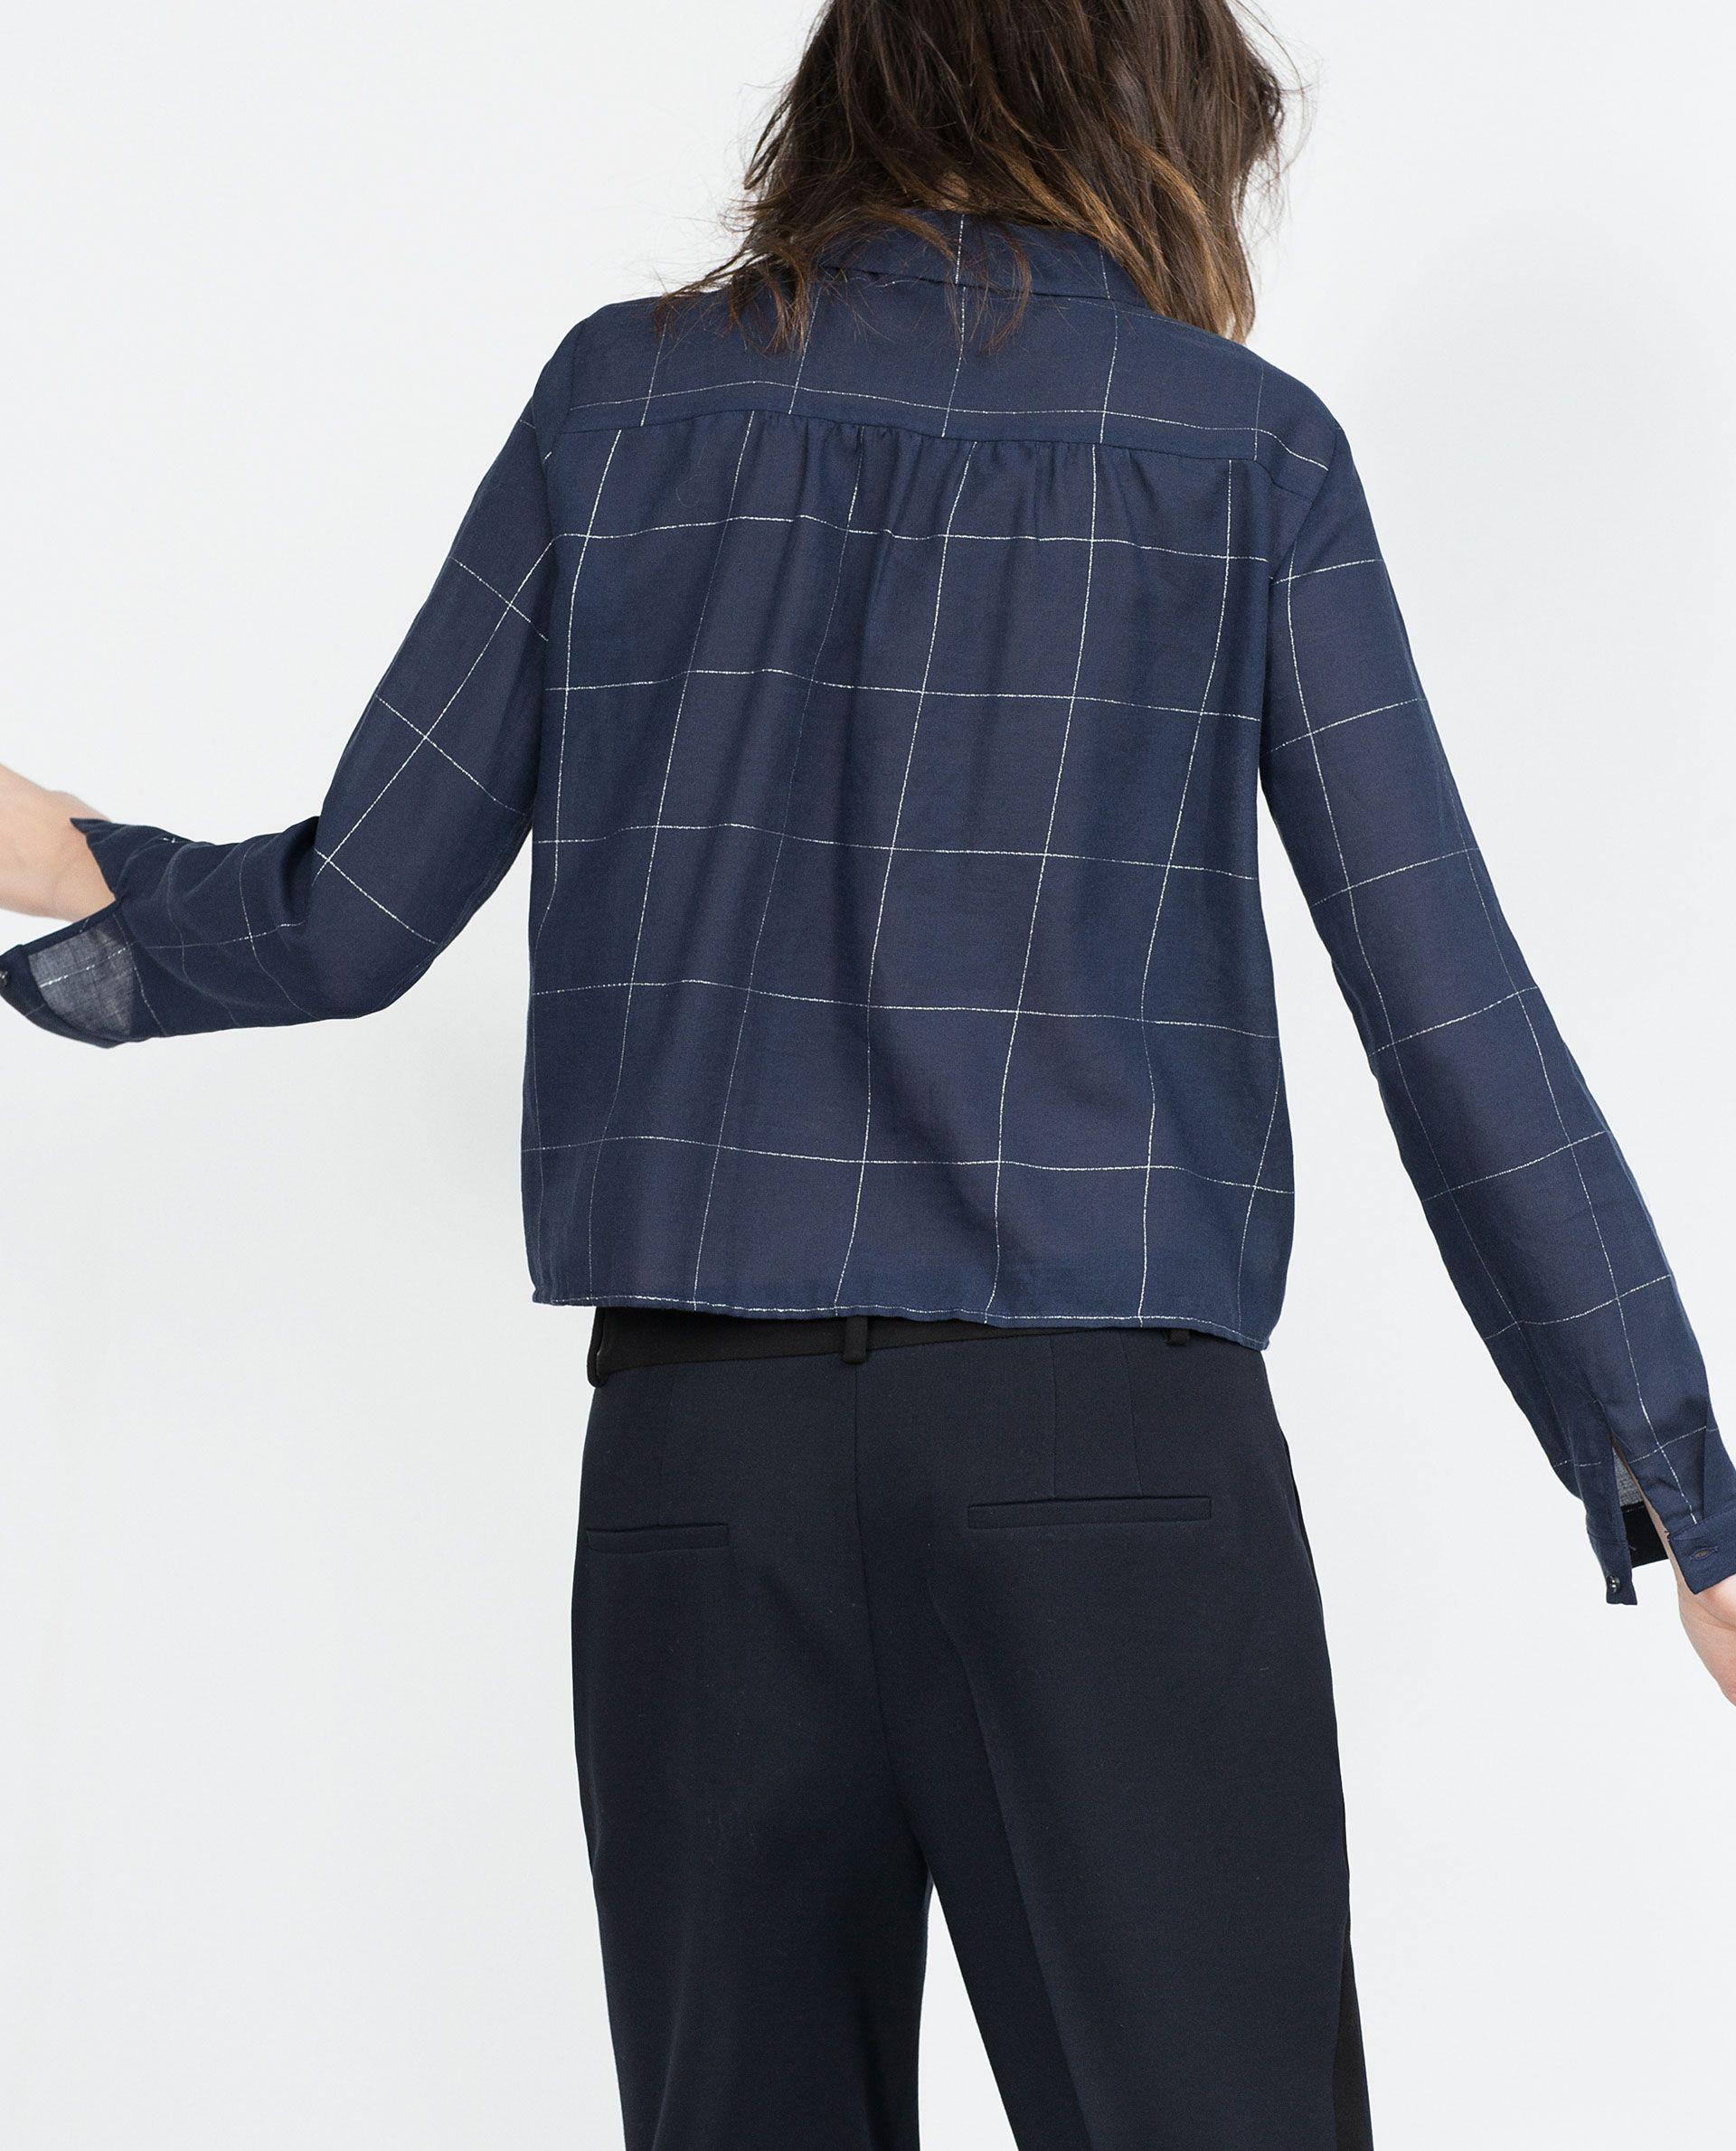 Zara flannel shirt mens  CHECK SHIRT  View all  Tops  WOMAN  ZARA United Kingdom